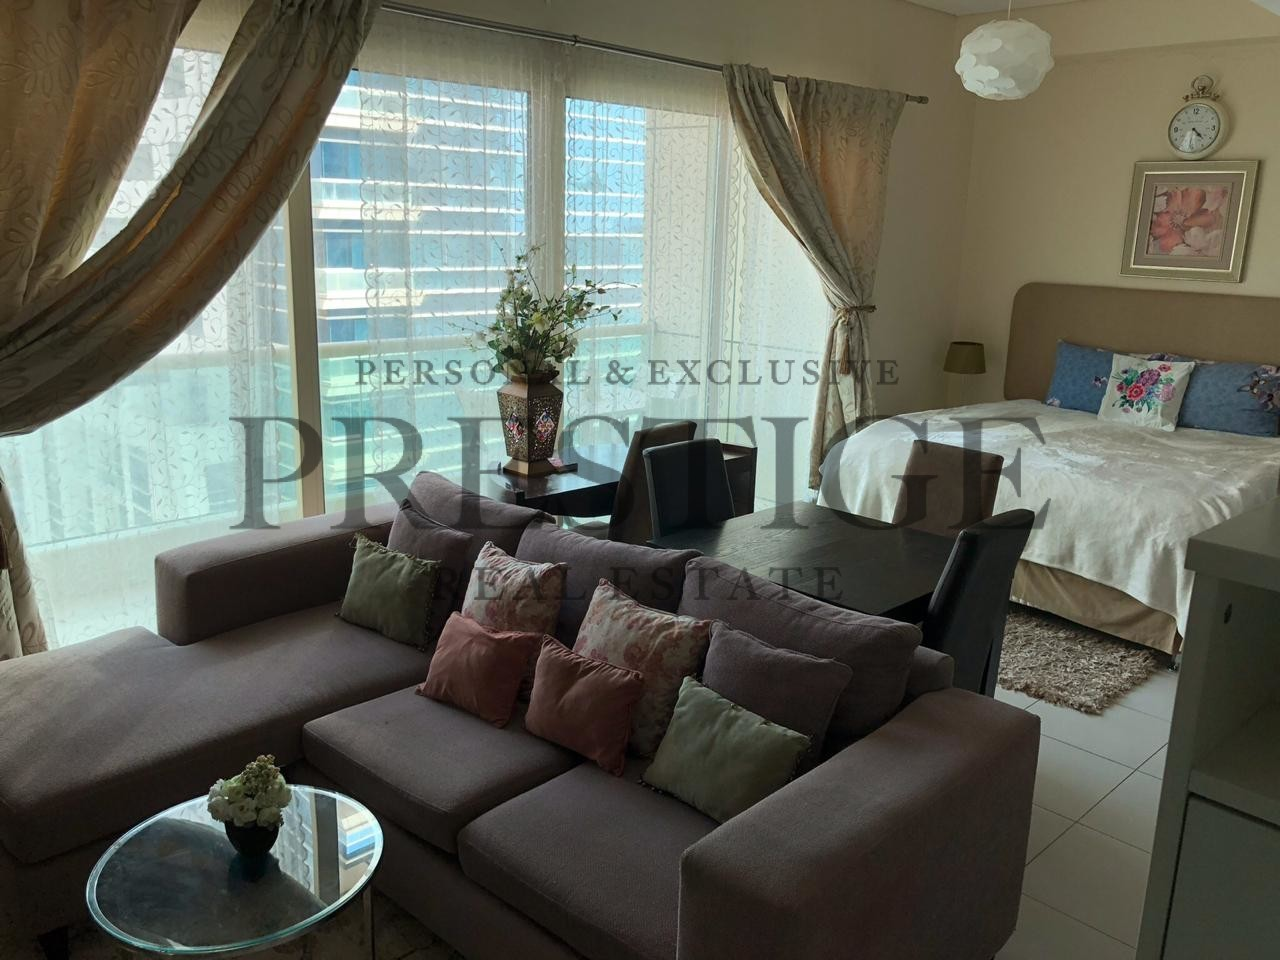 studio-apartment-for-rent-in-royal-oceanic